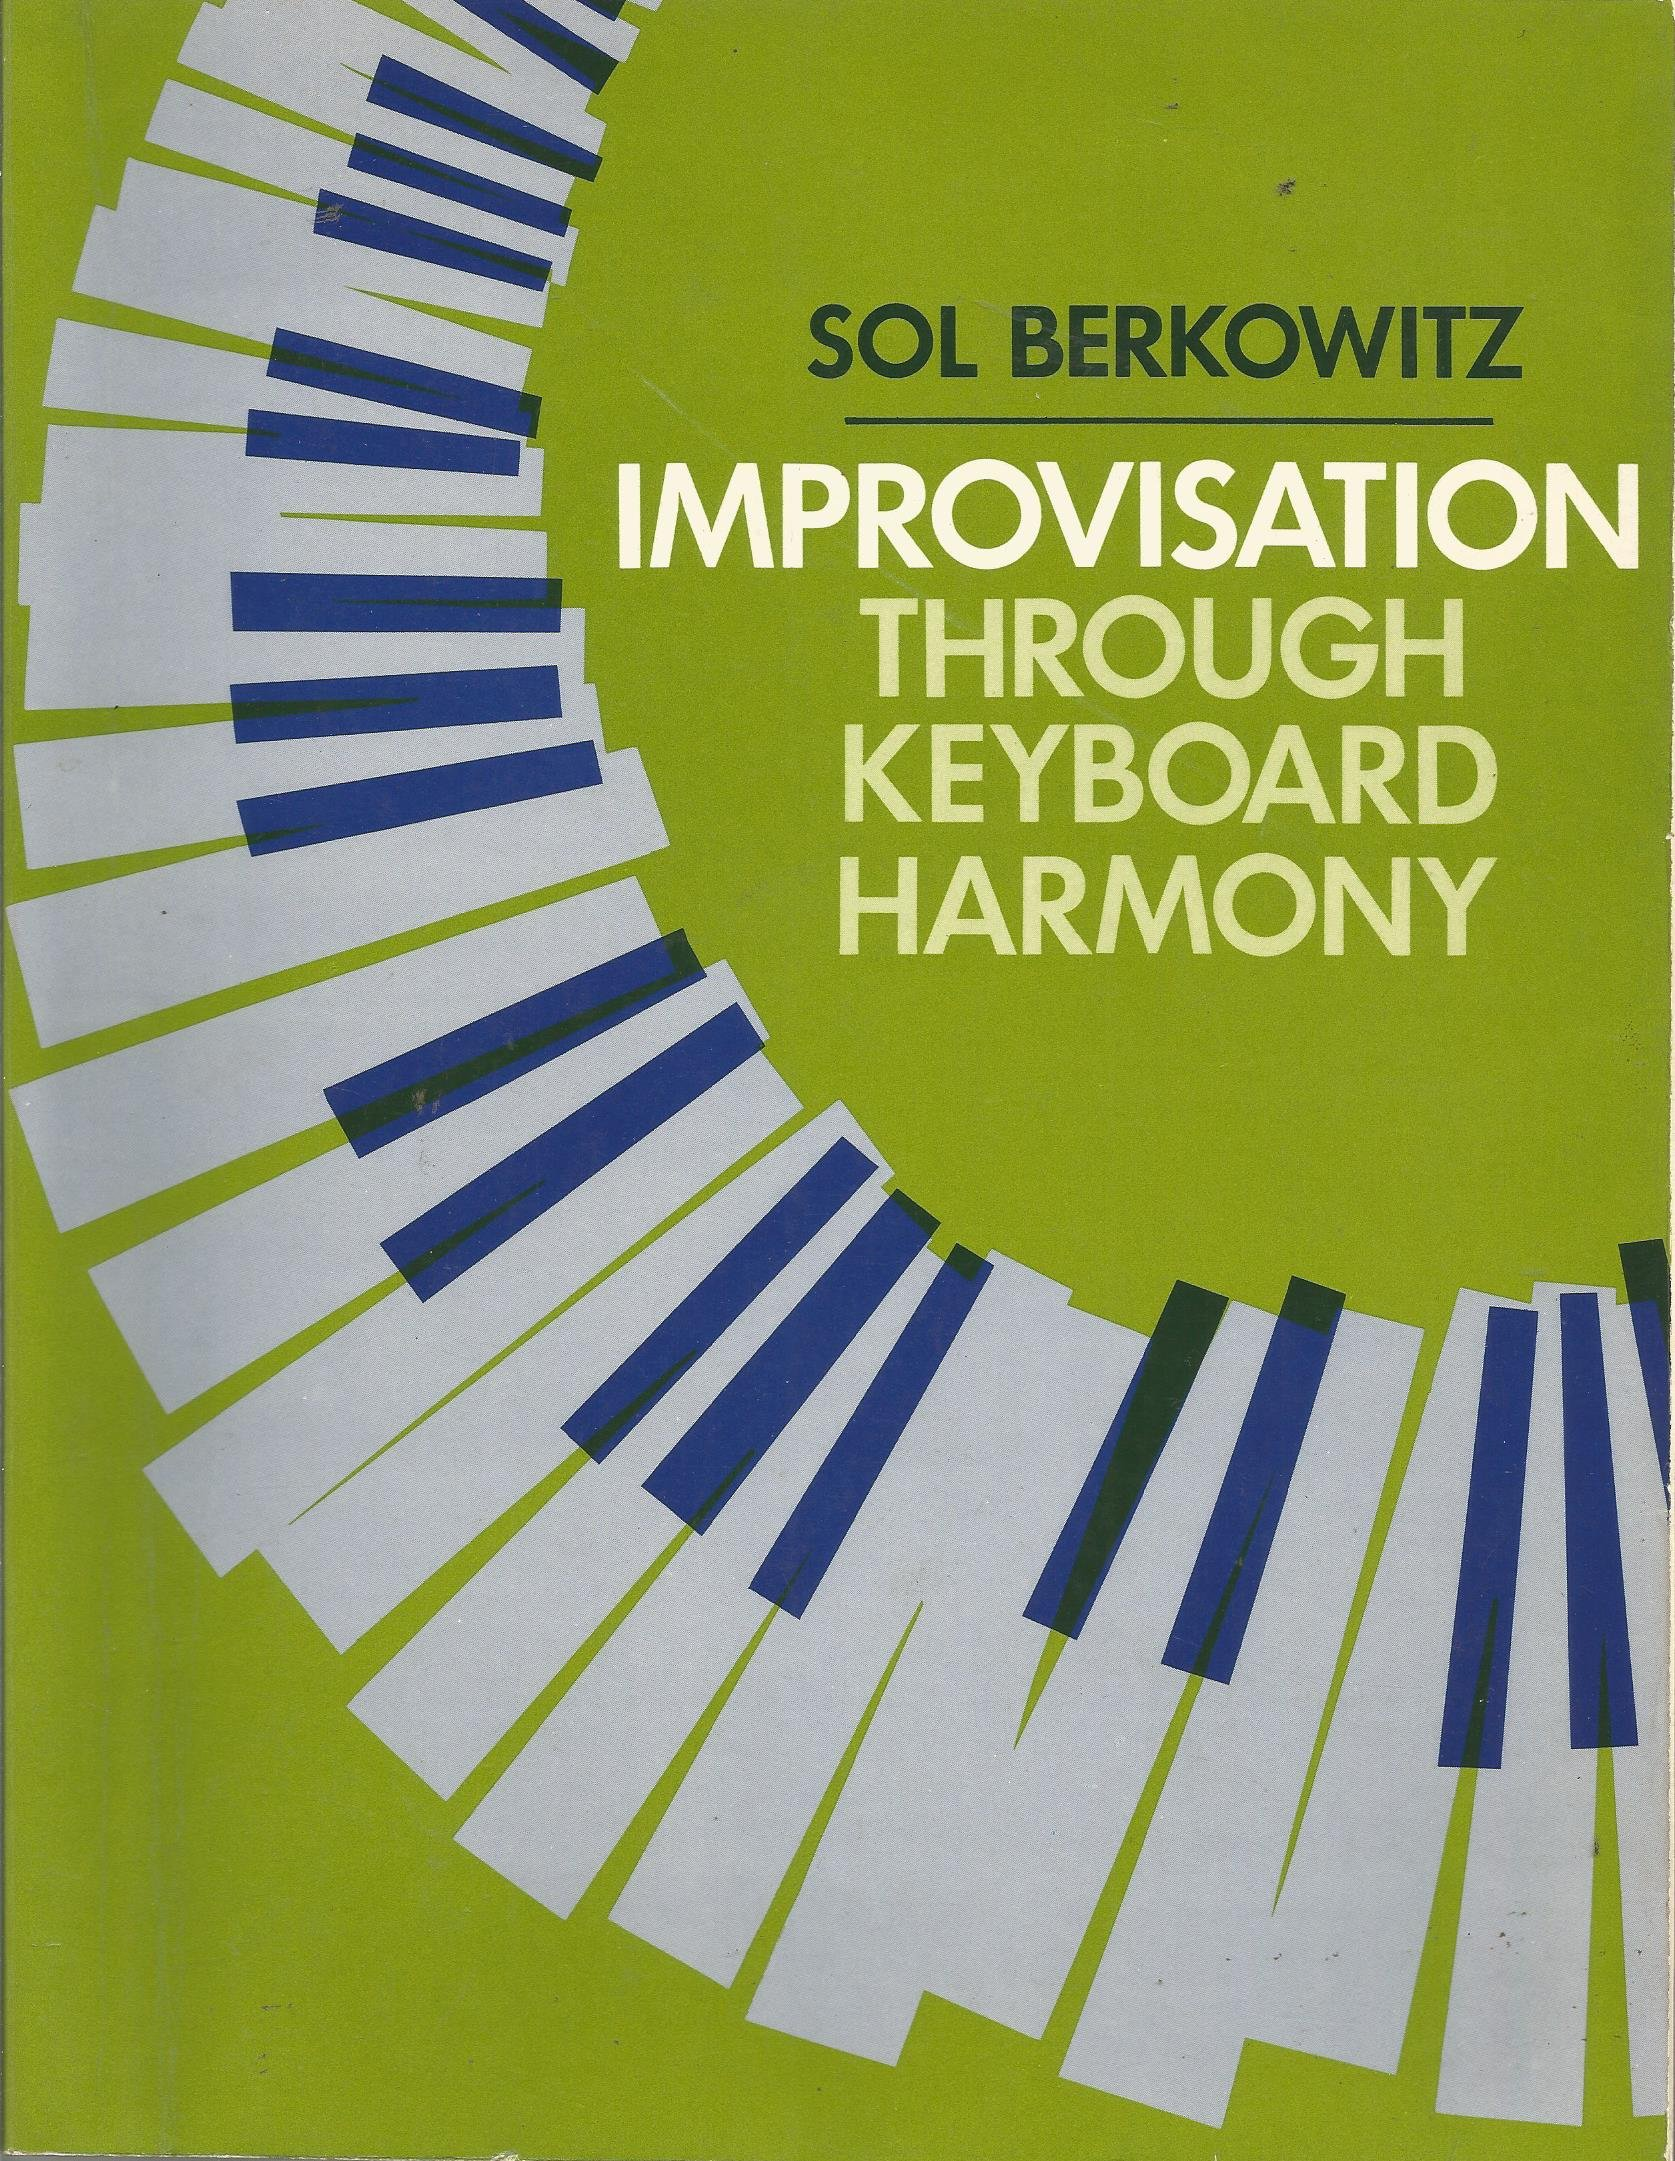 Improvisation through keyboard harmony sol berkowitz 9780134534725 improvisation through keyboard harmony sol berkowitz 9780134534725 amazon books fandeluxe Images